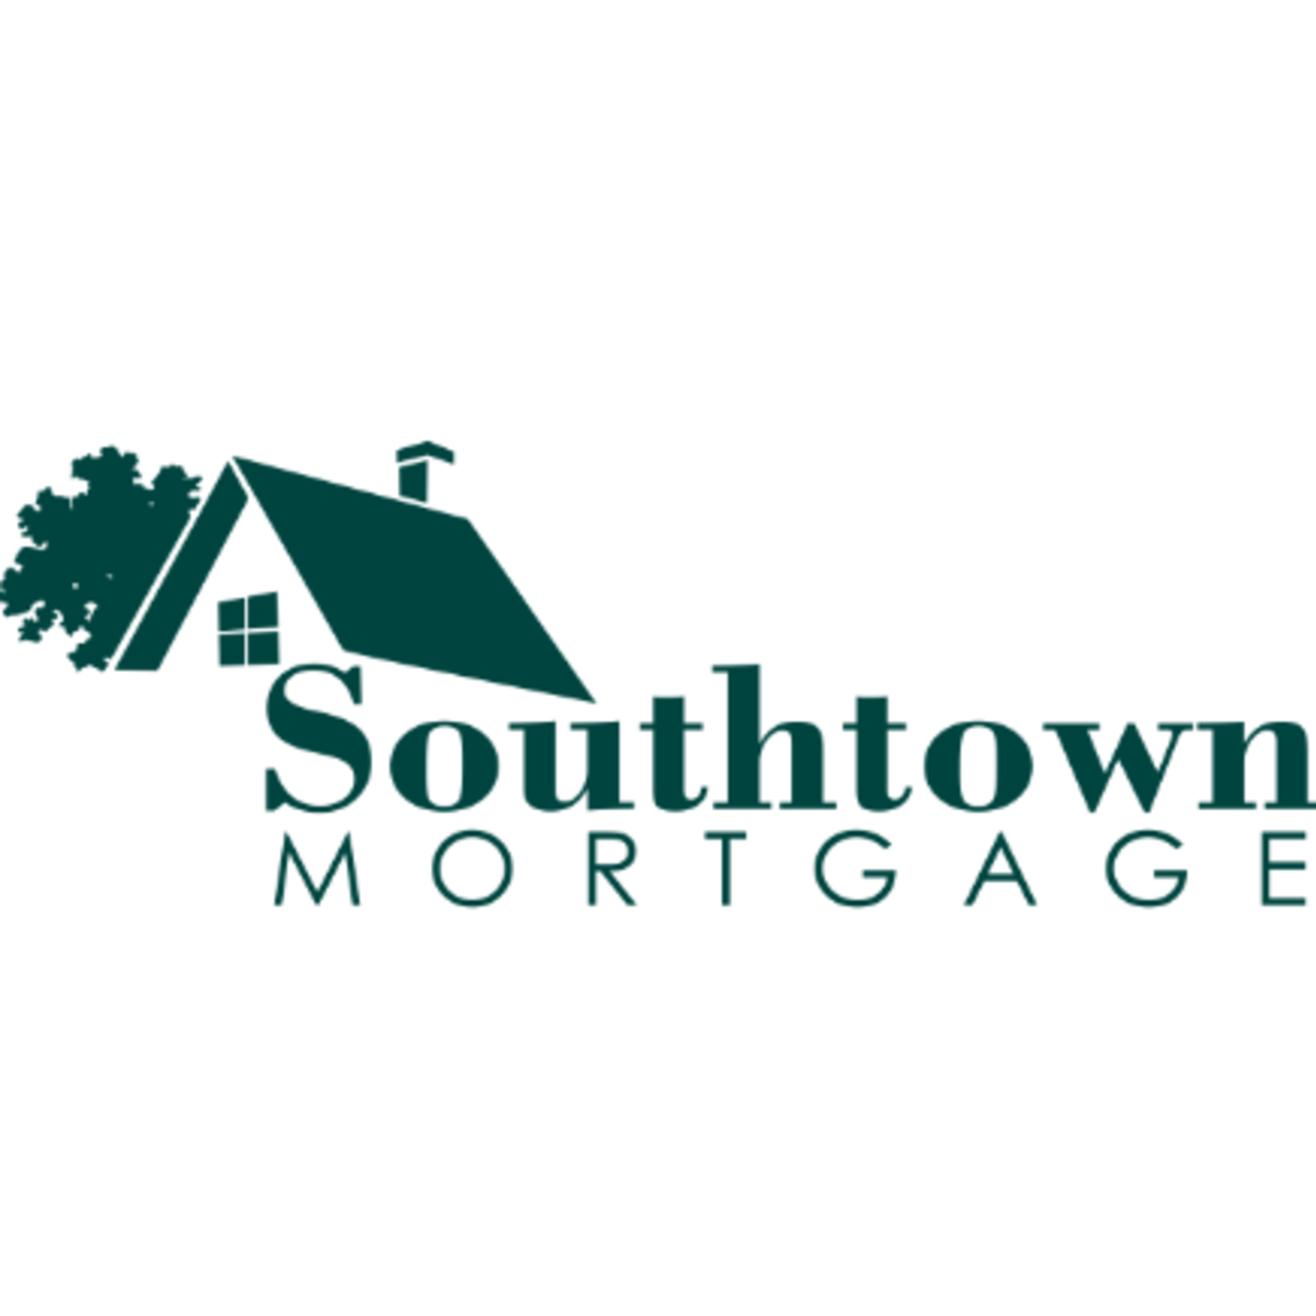 Keller McKaig | Southtown Mortgage